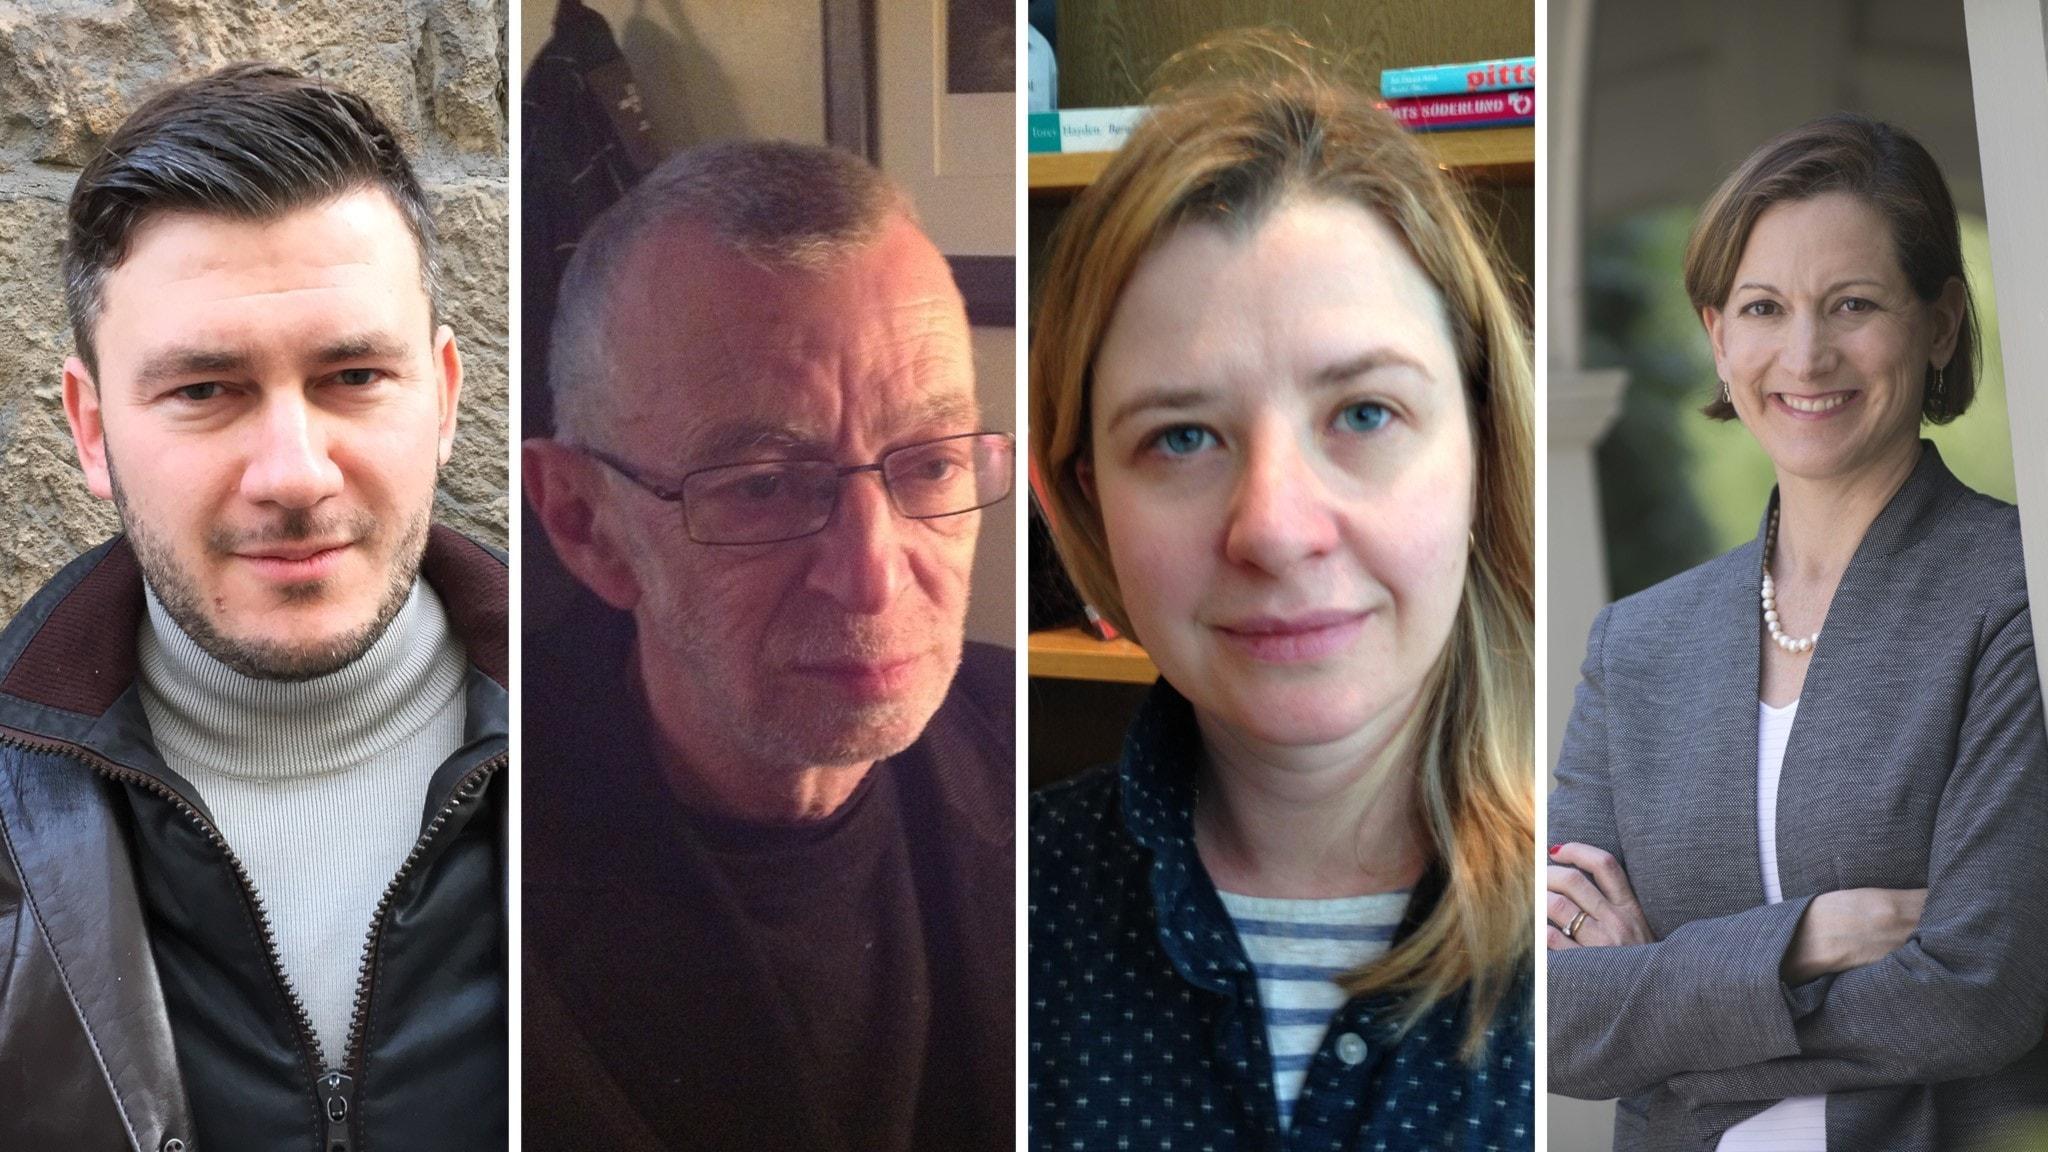 Författarna Dmitrij Gluchovskij, Lev Rubinstein, Dasha Tolstikova och Anne Applebaum